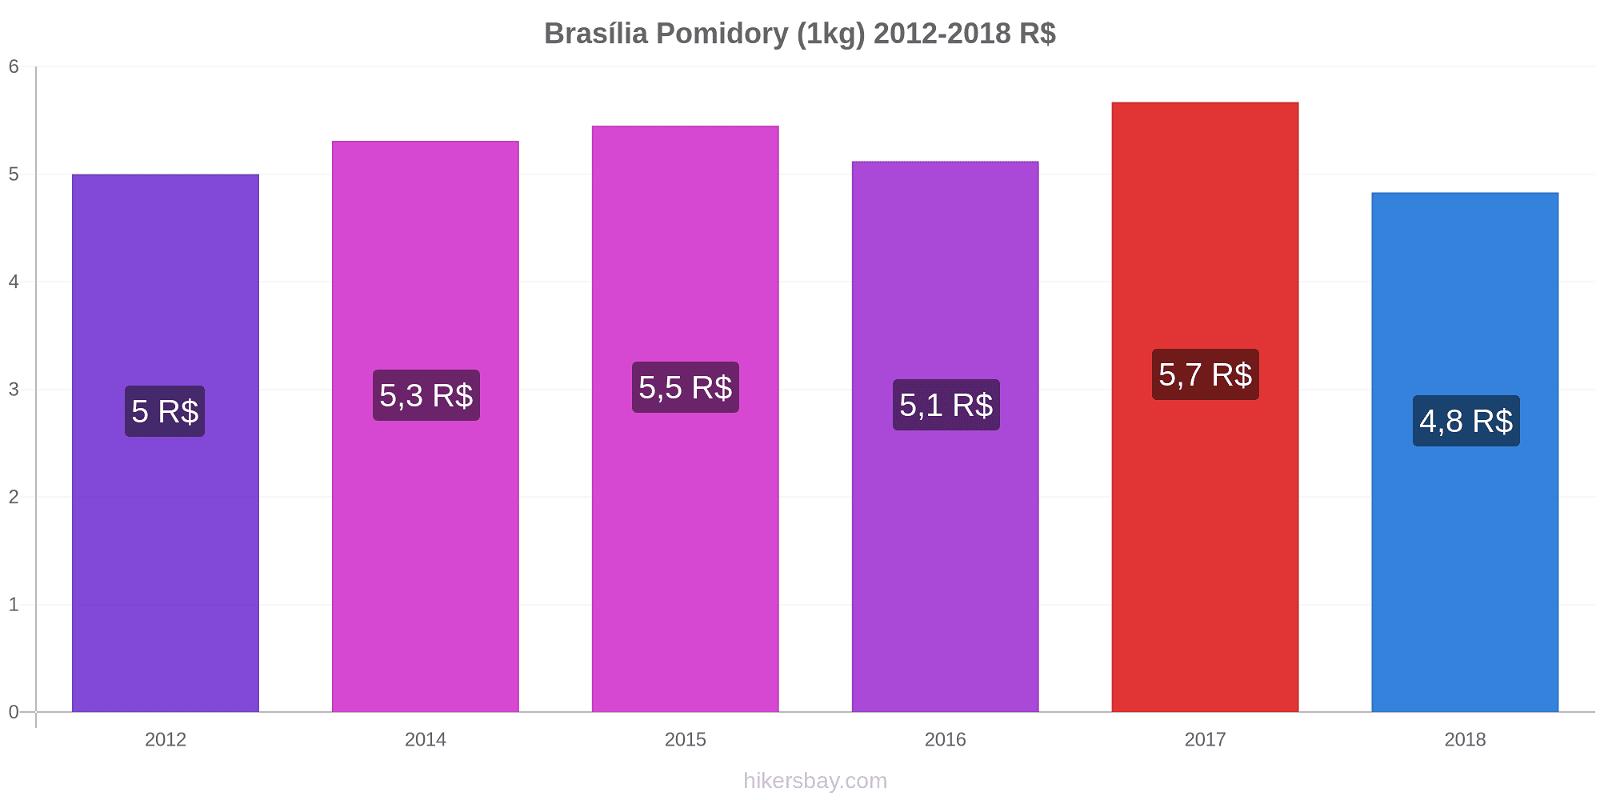 Brasília zmiany cen Pomidory (1kg) hikersbay.com